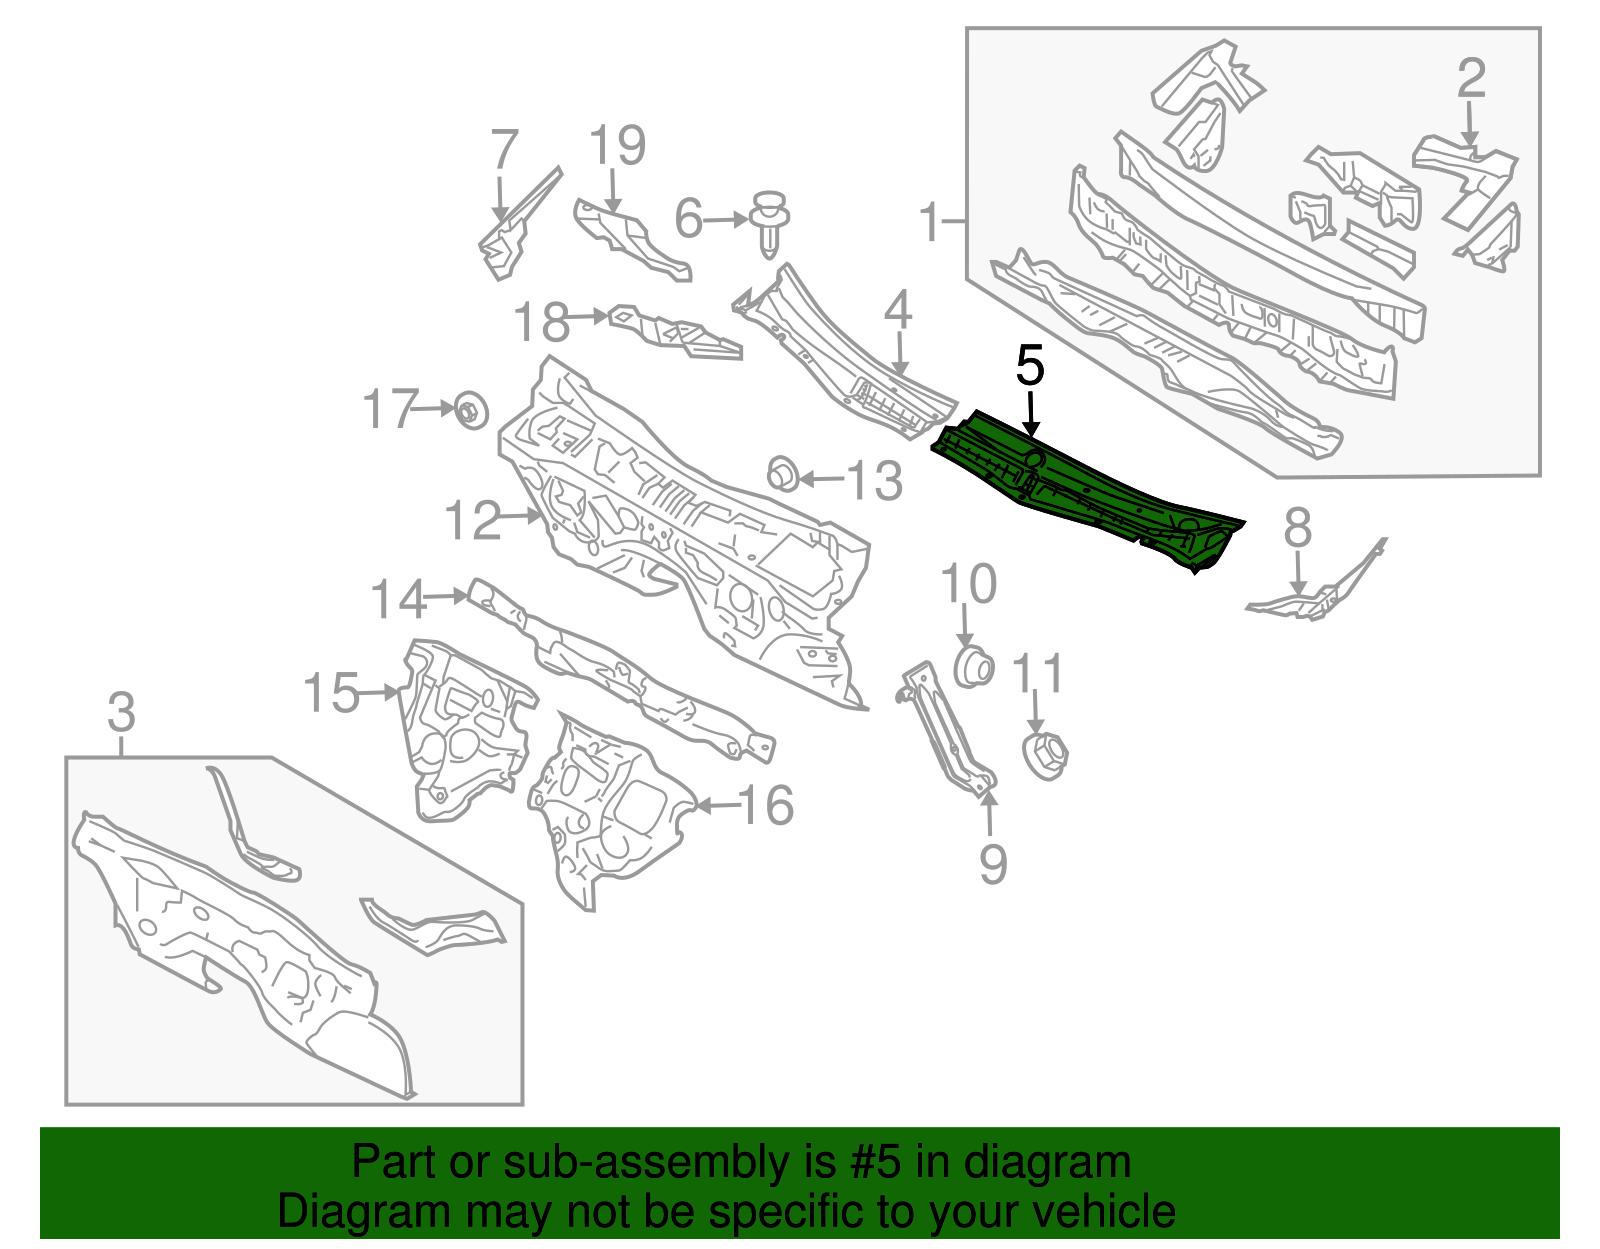 Subaru Oem 08 14 Tribeca Cowl Panel Windshield Wiper Motor Cover Diagram Picture 2 Of